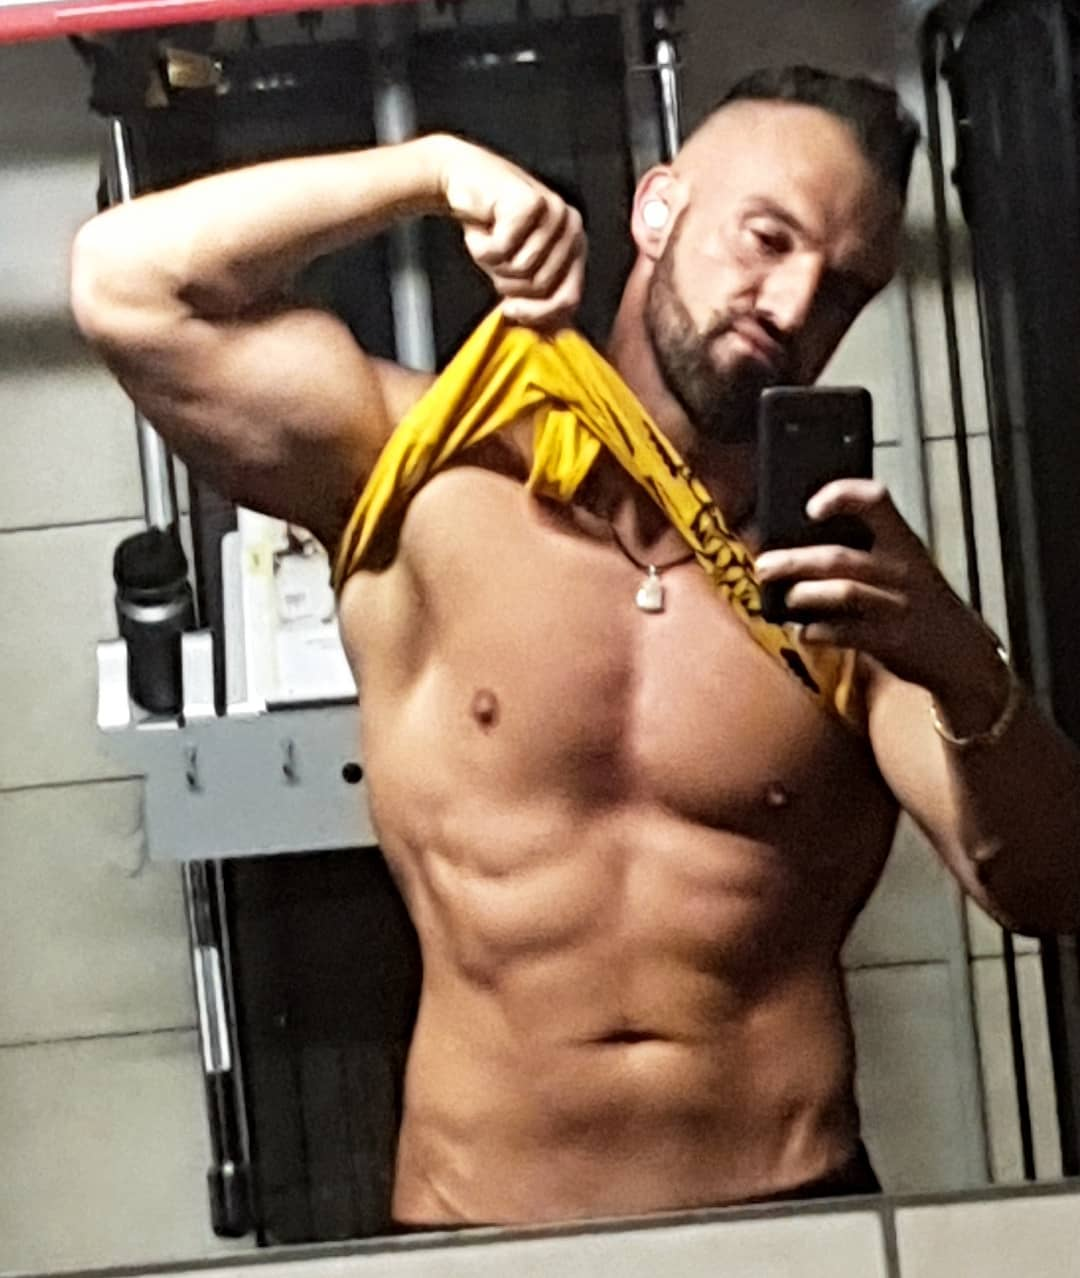 Schaut euch mal meinen neuen Ramboanhänger an… hab extra das Shirt ein wenig hochgezogen, damit ihr ihn besser seht. Gefällt er euch?😉😘😈 . #rambo #rambobody #transformation #abs #chest #sixpacks #muscles #gym #training #bodybuilding #fit #fitness #gainz #beastmode #bossmode #bangboss #mcfit #johnreed #berlin #nude #naked #posing #pumped #instafit #fitfam #body #natural #gymmotivation #motivation #diet